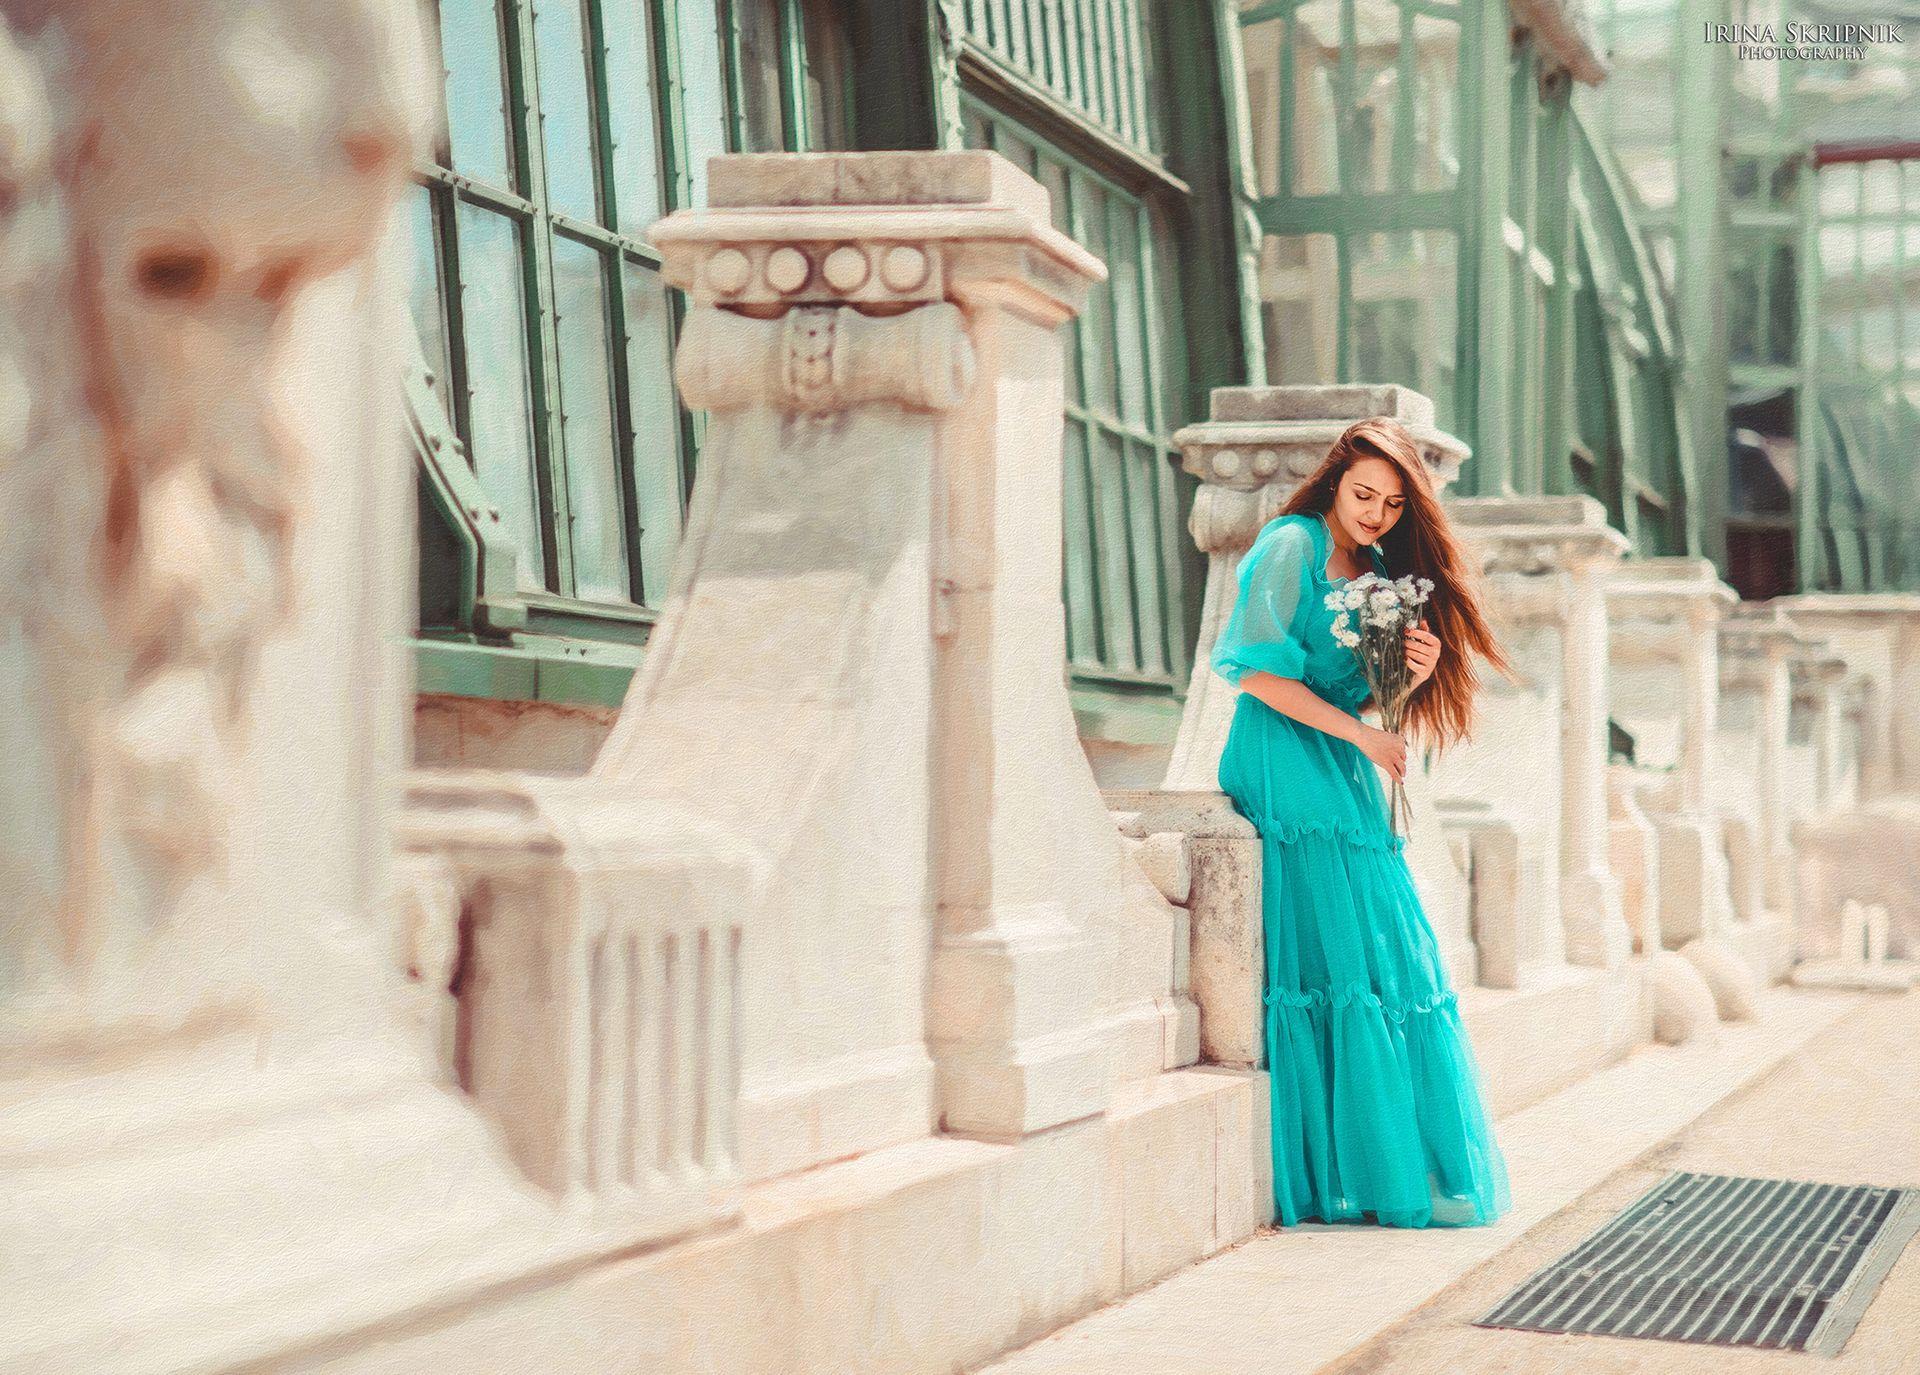 Irina Skripnik Photography 31012